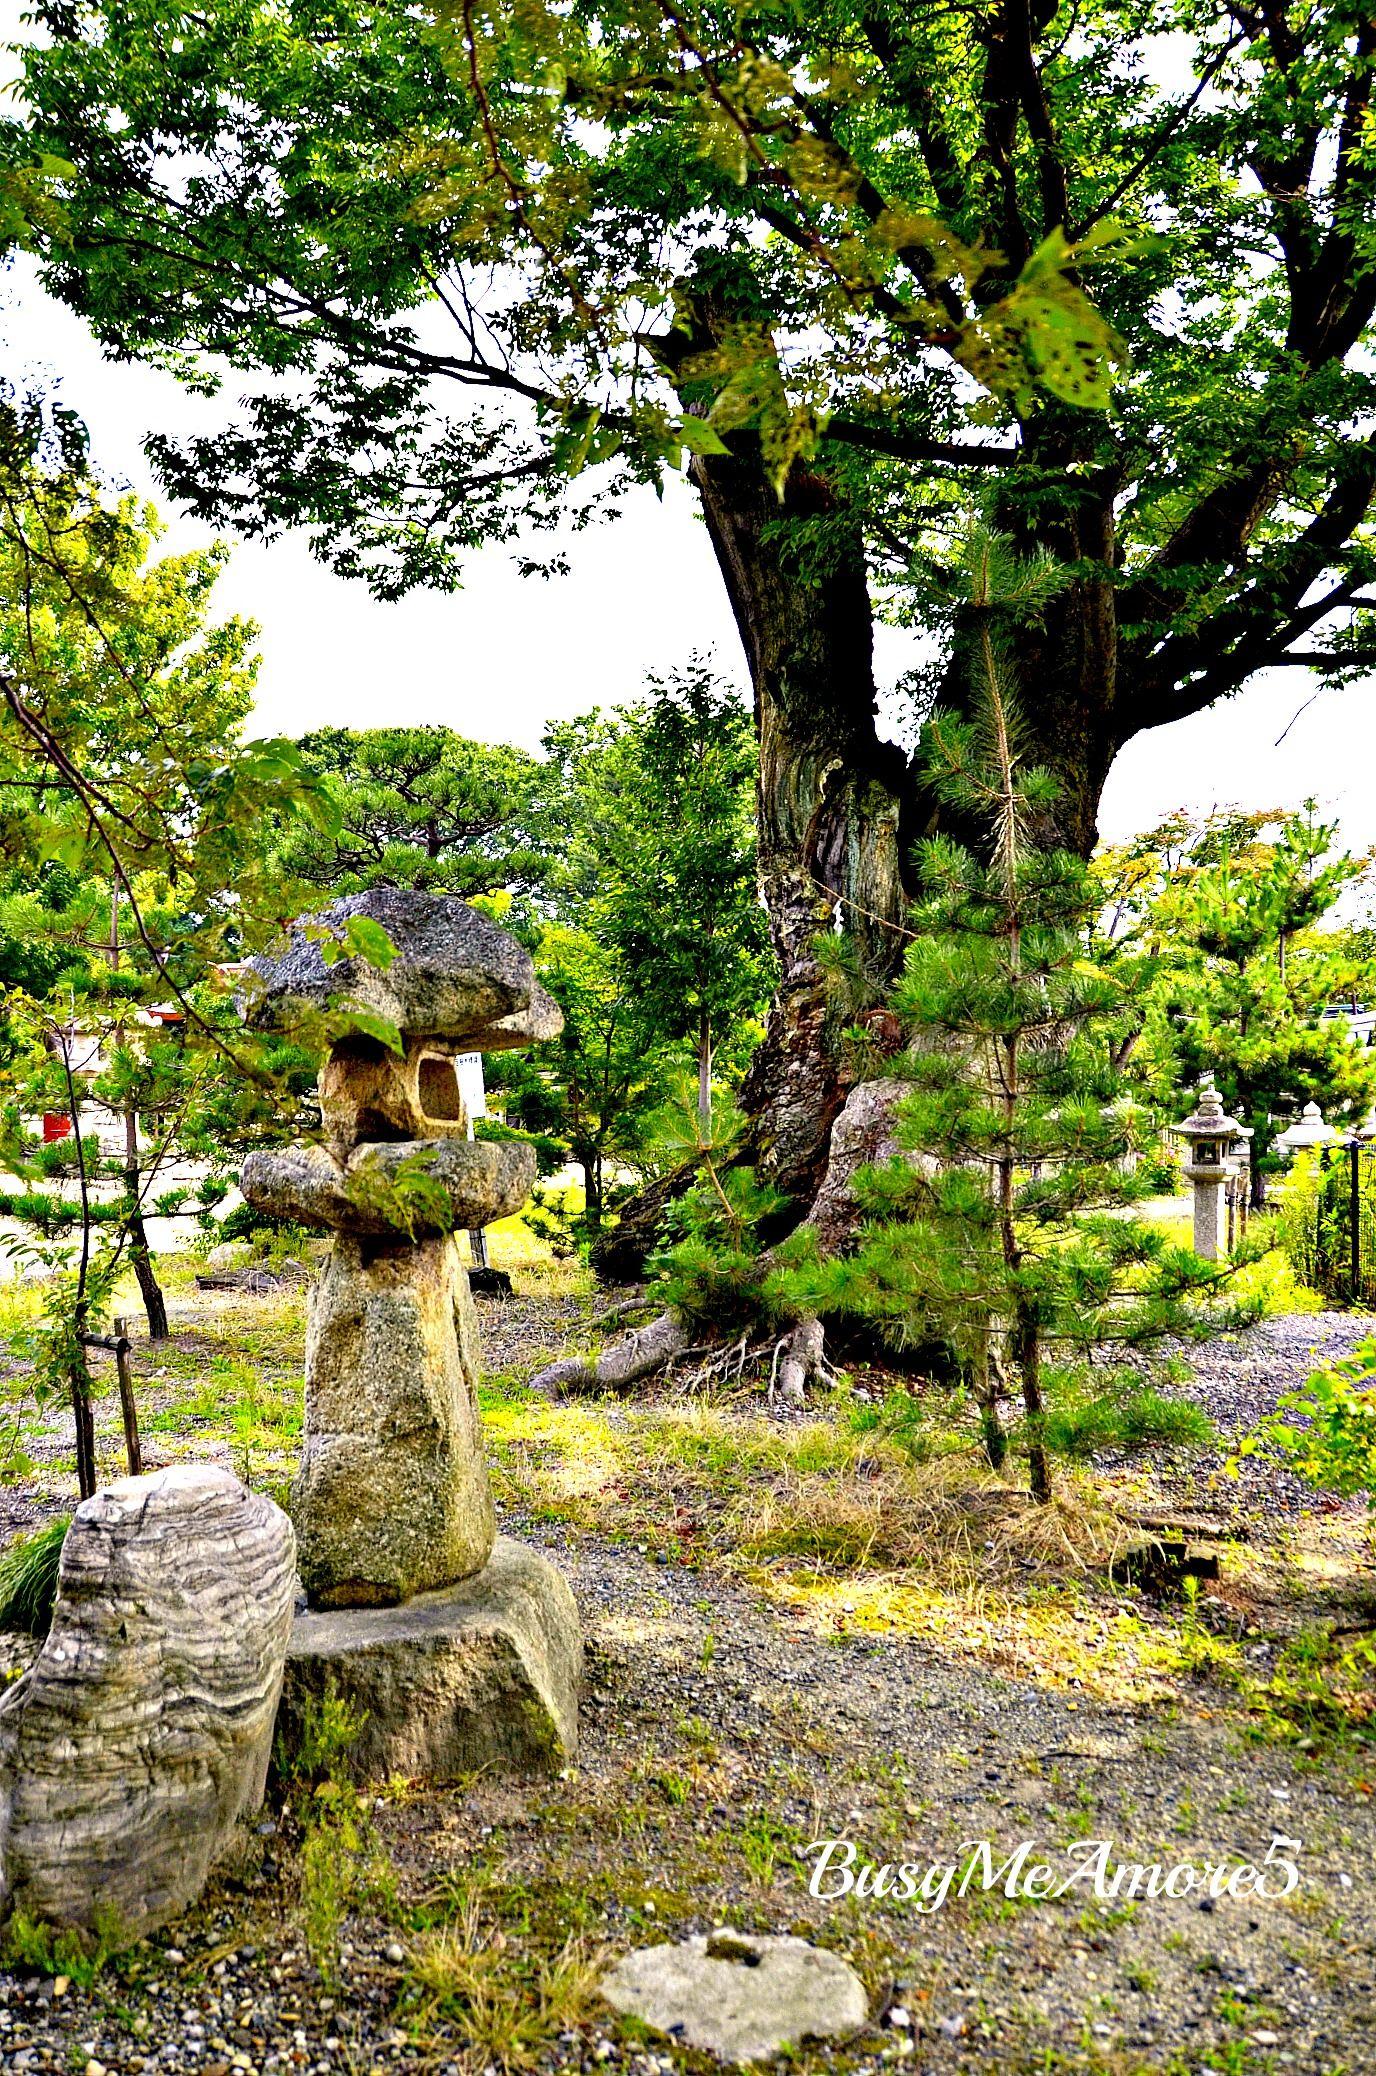 28 Japanese Garden Design Ideas To Style Up Your Backyard: Pin By A G. Maeda On ZEN (Meditation) Japanese Garden